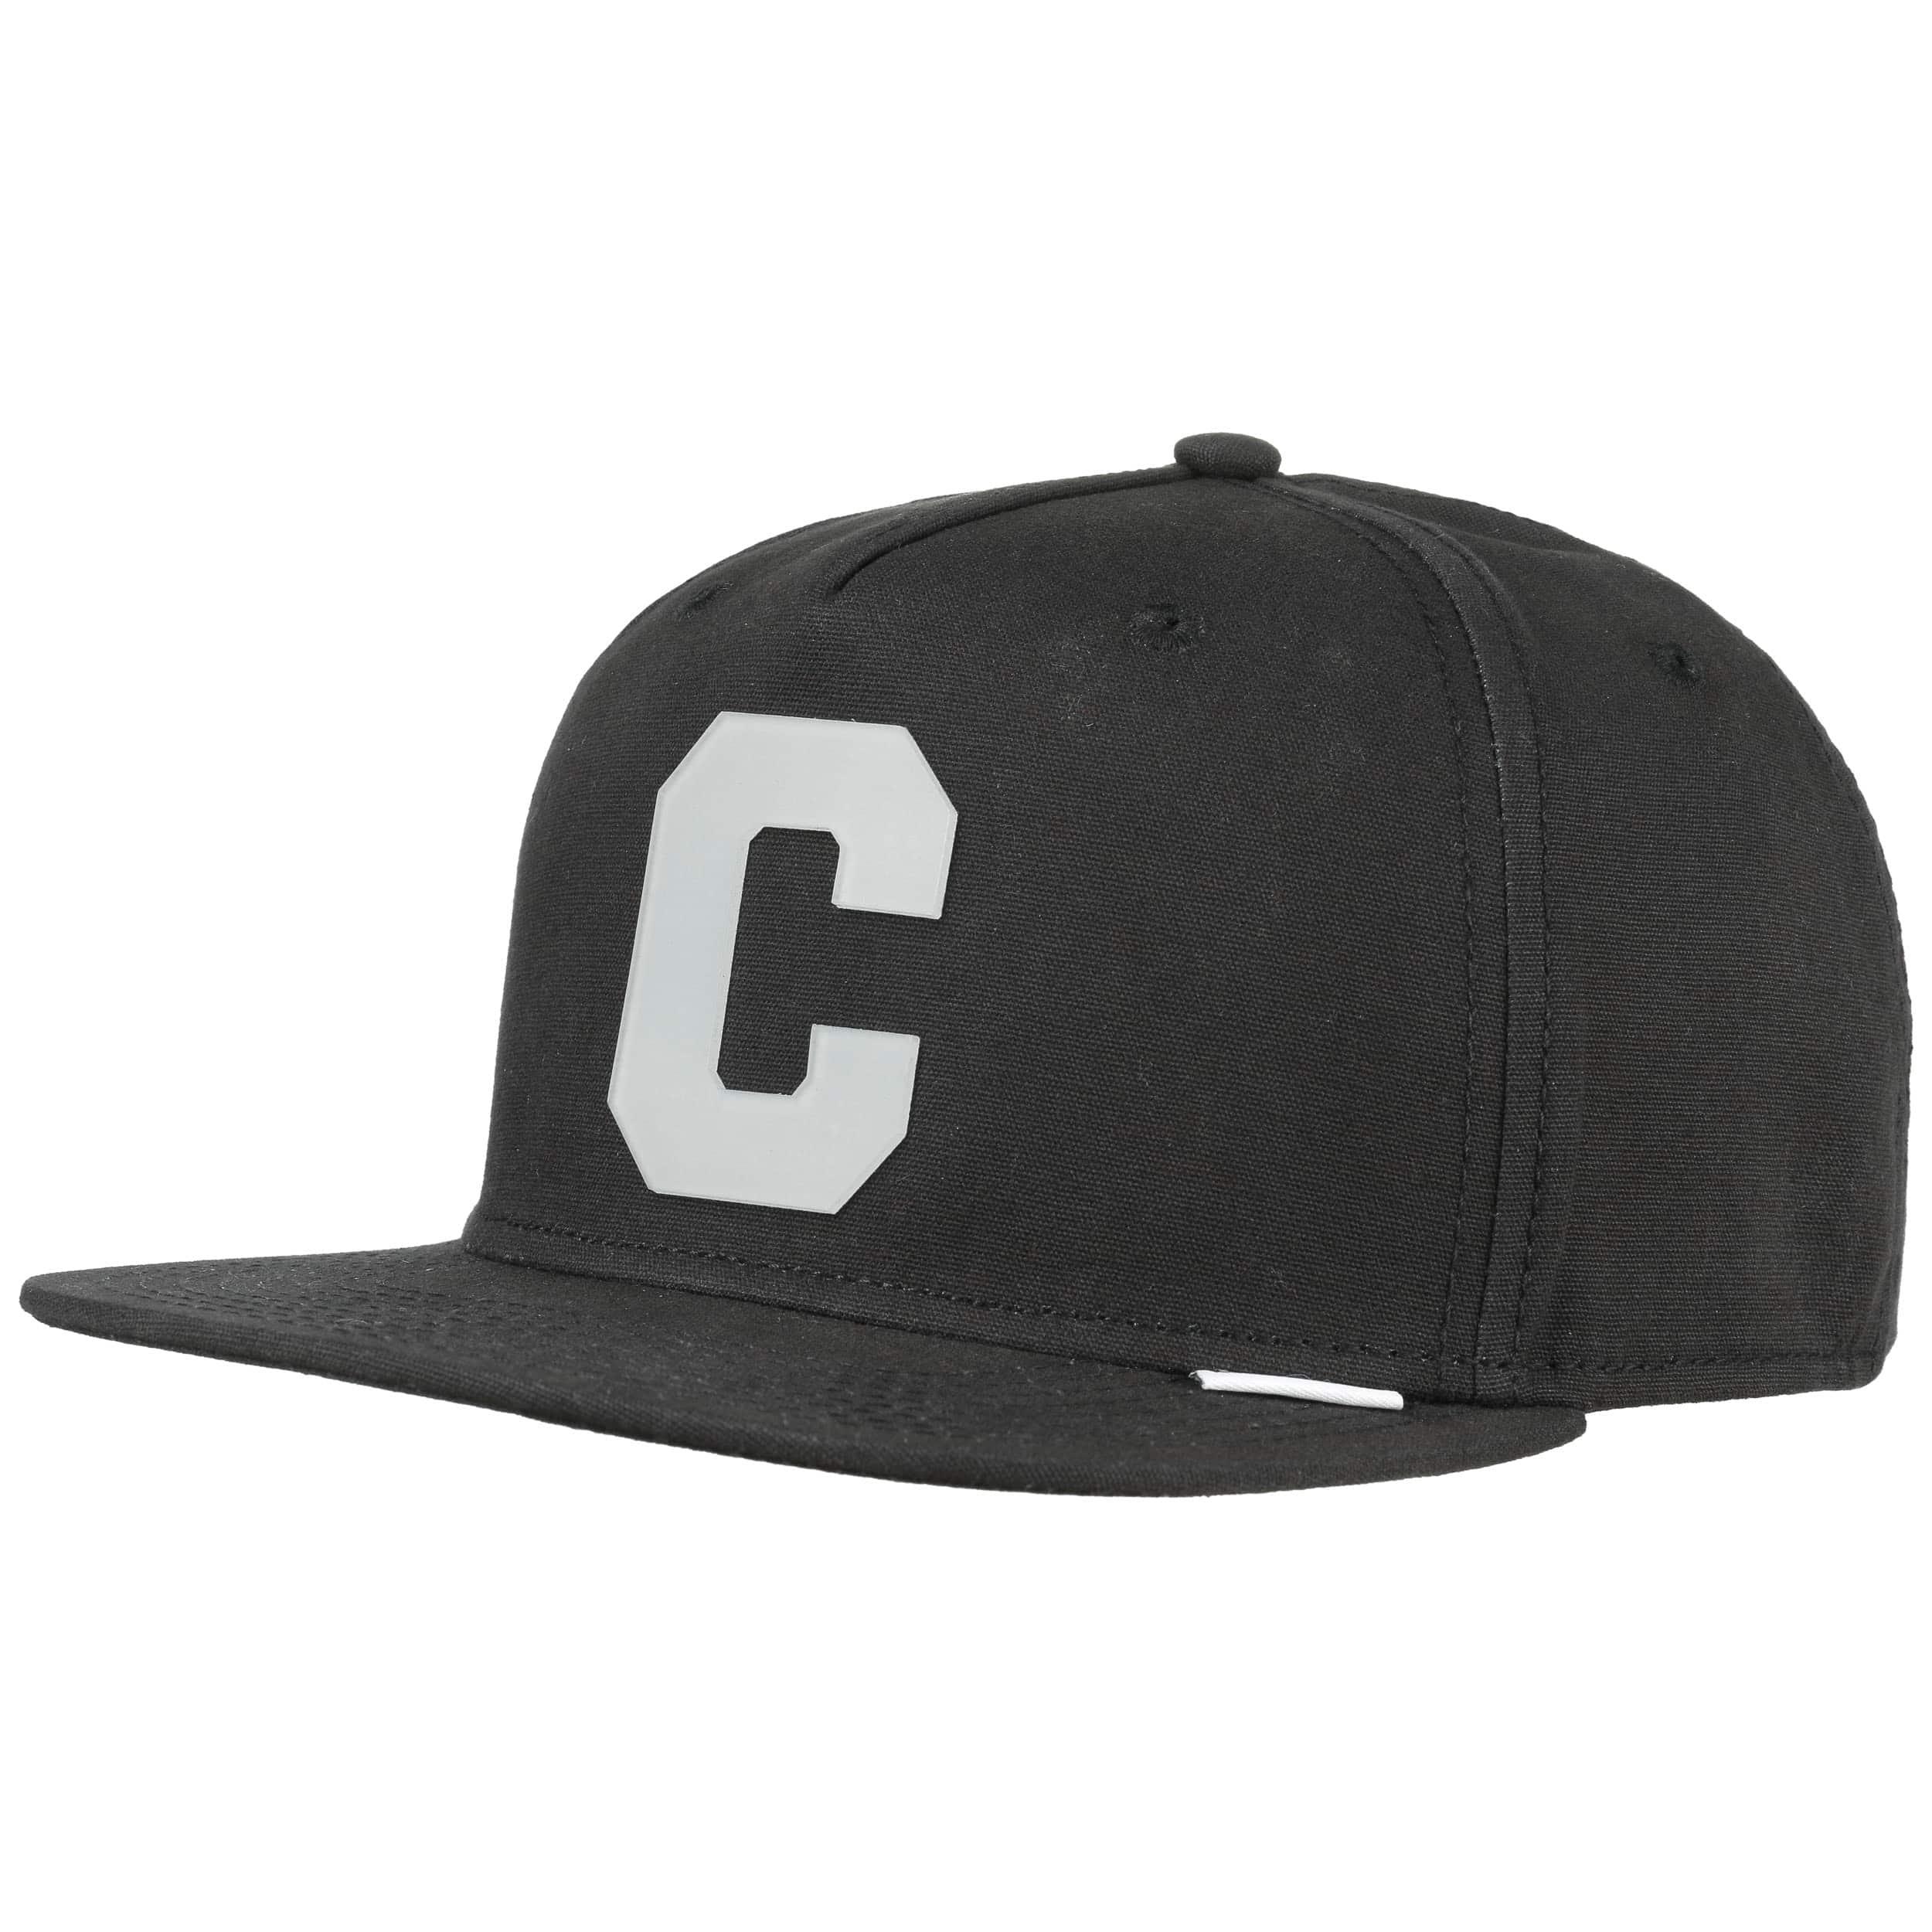 e0615676 ... Translucent C Snapback Cap by Converse - black 5